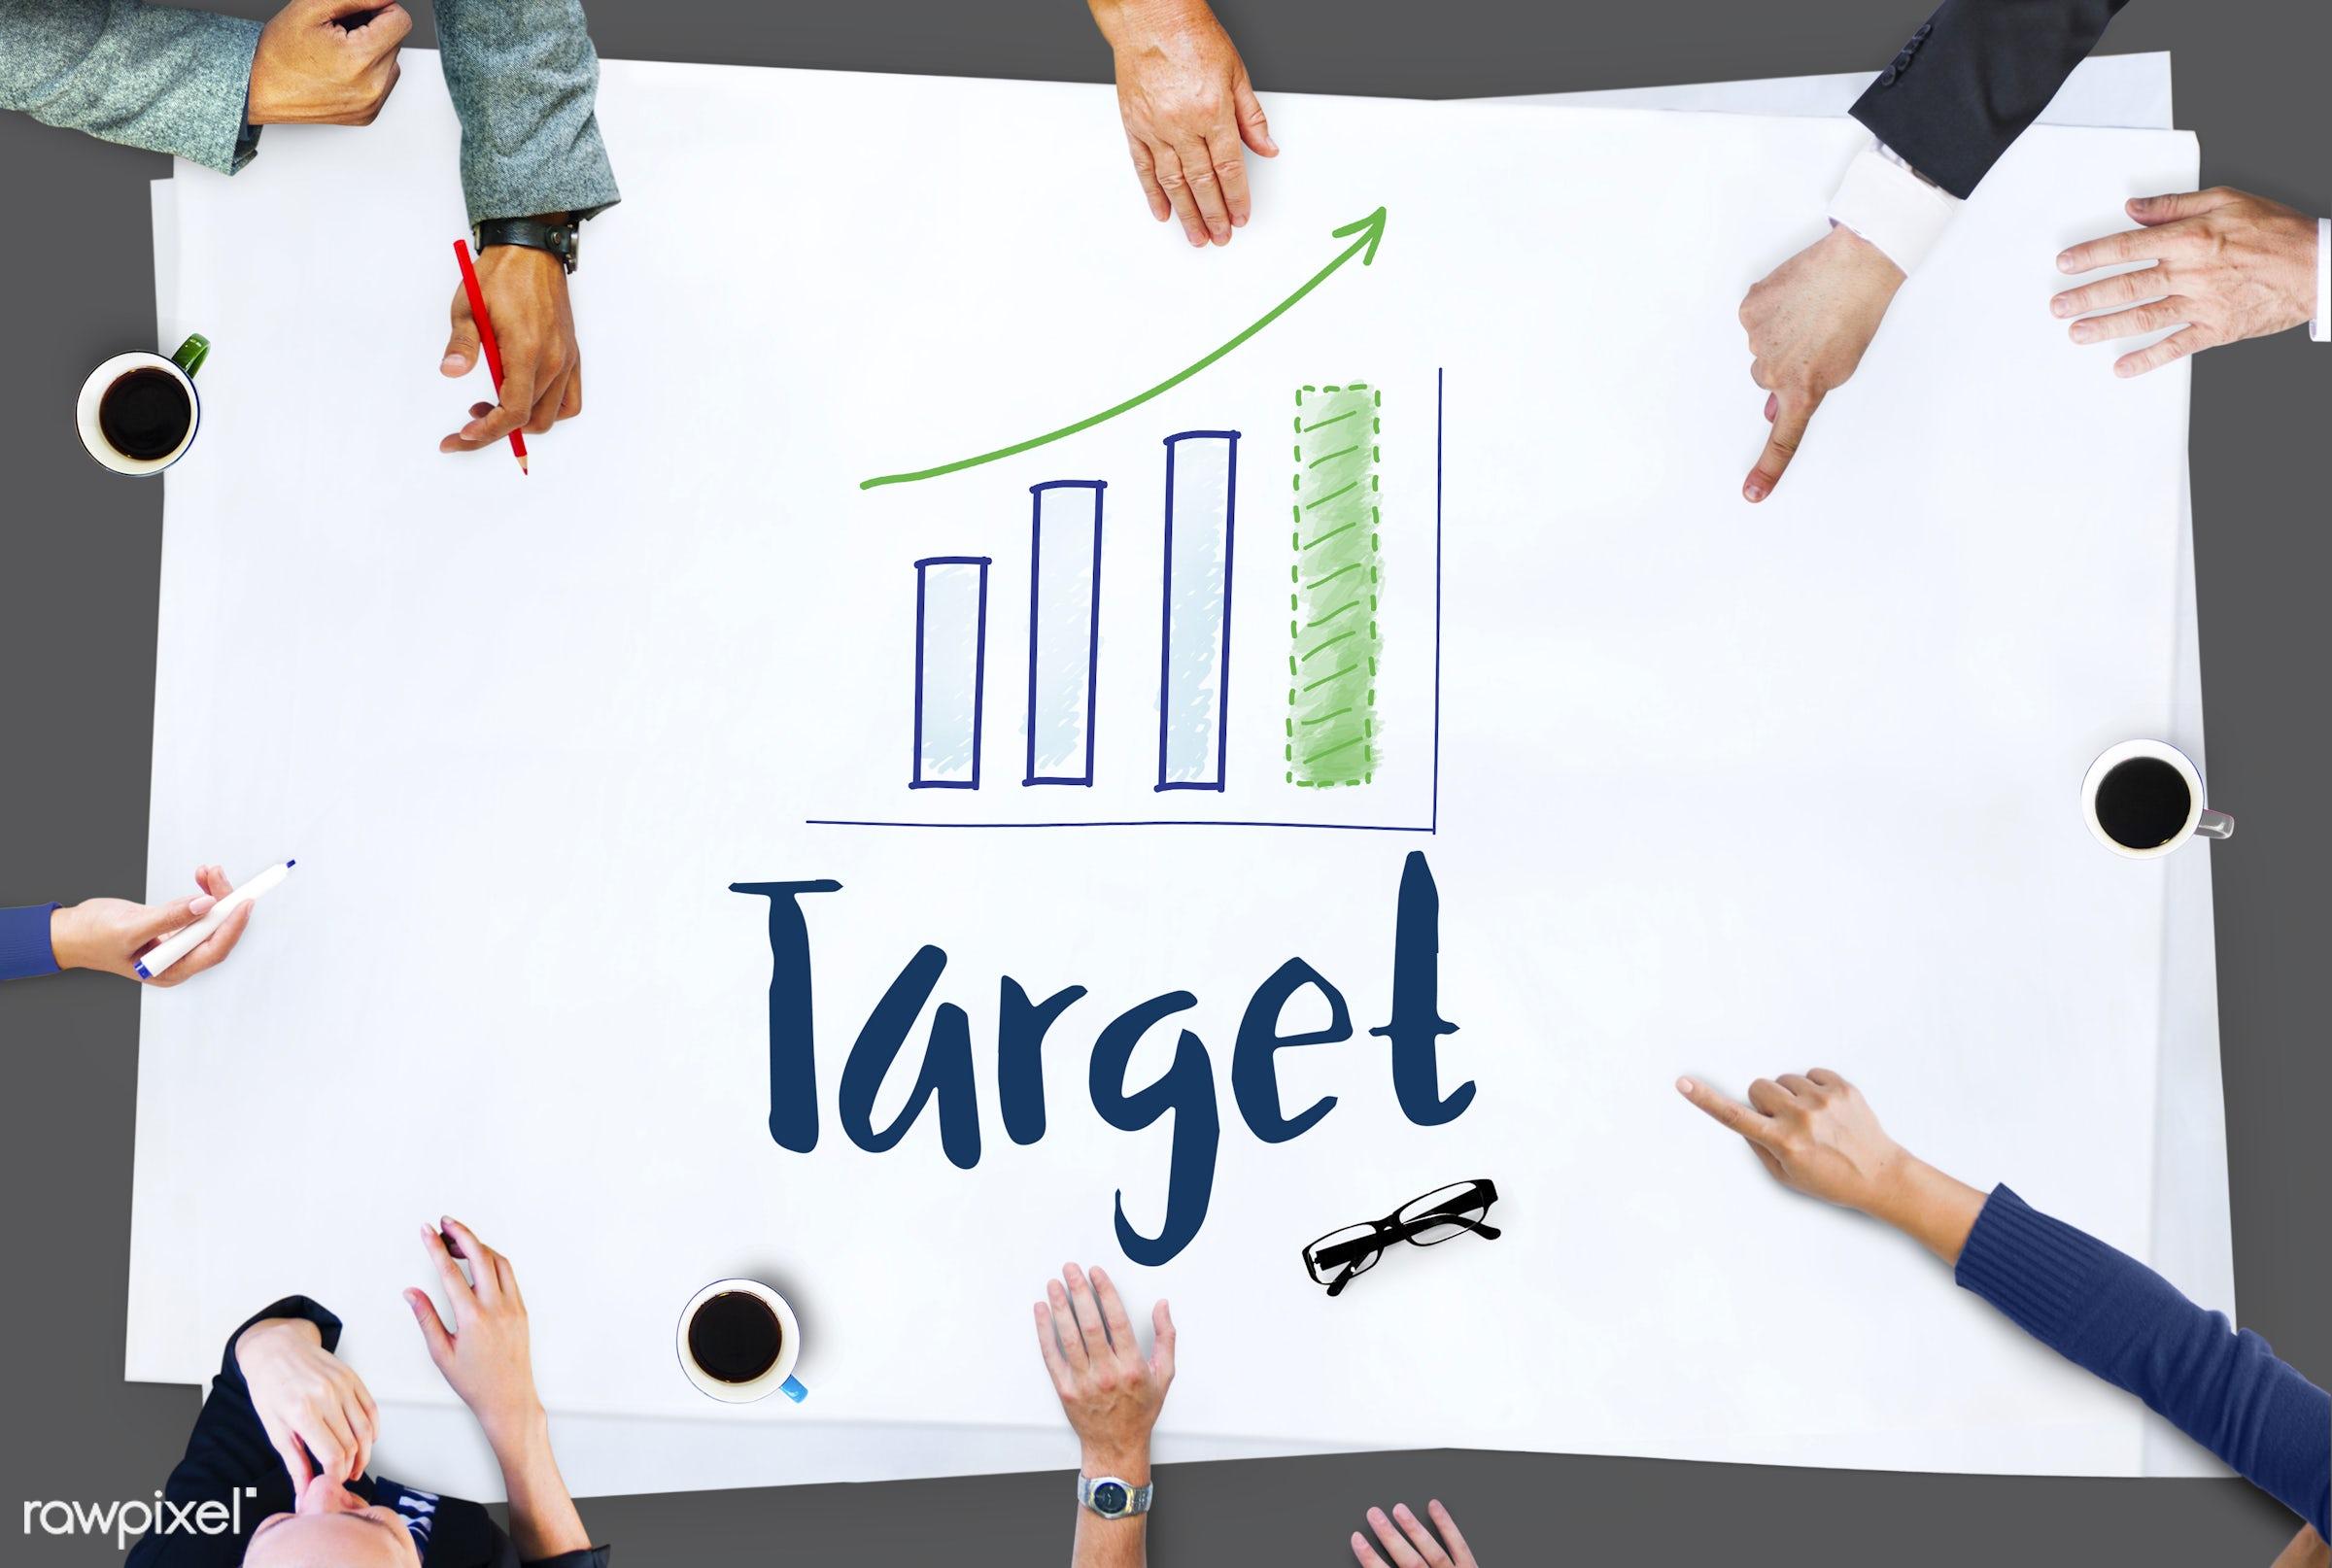 aerial view, analyse, analysis, brainstorming, business, businessmen, businesswomen, casual, chart, communication, data....